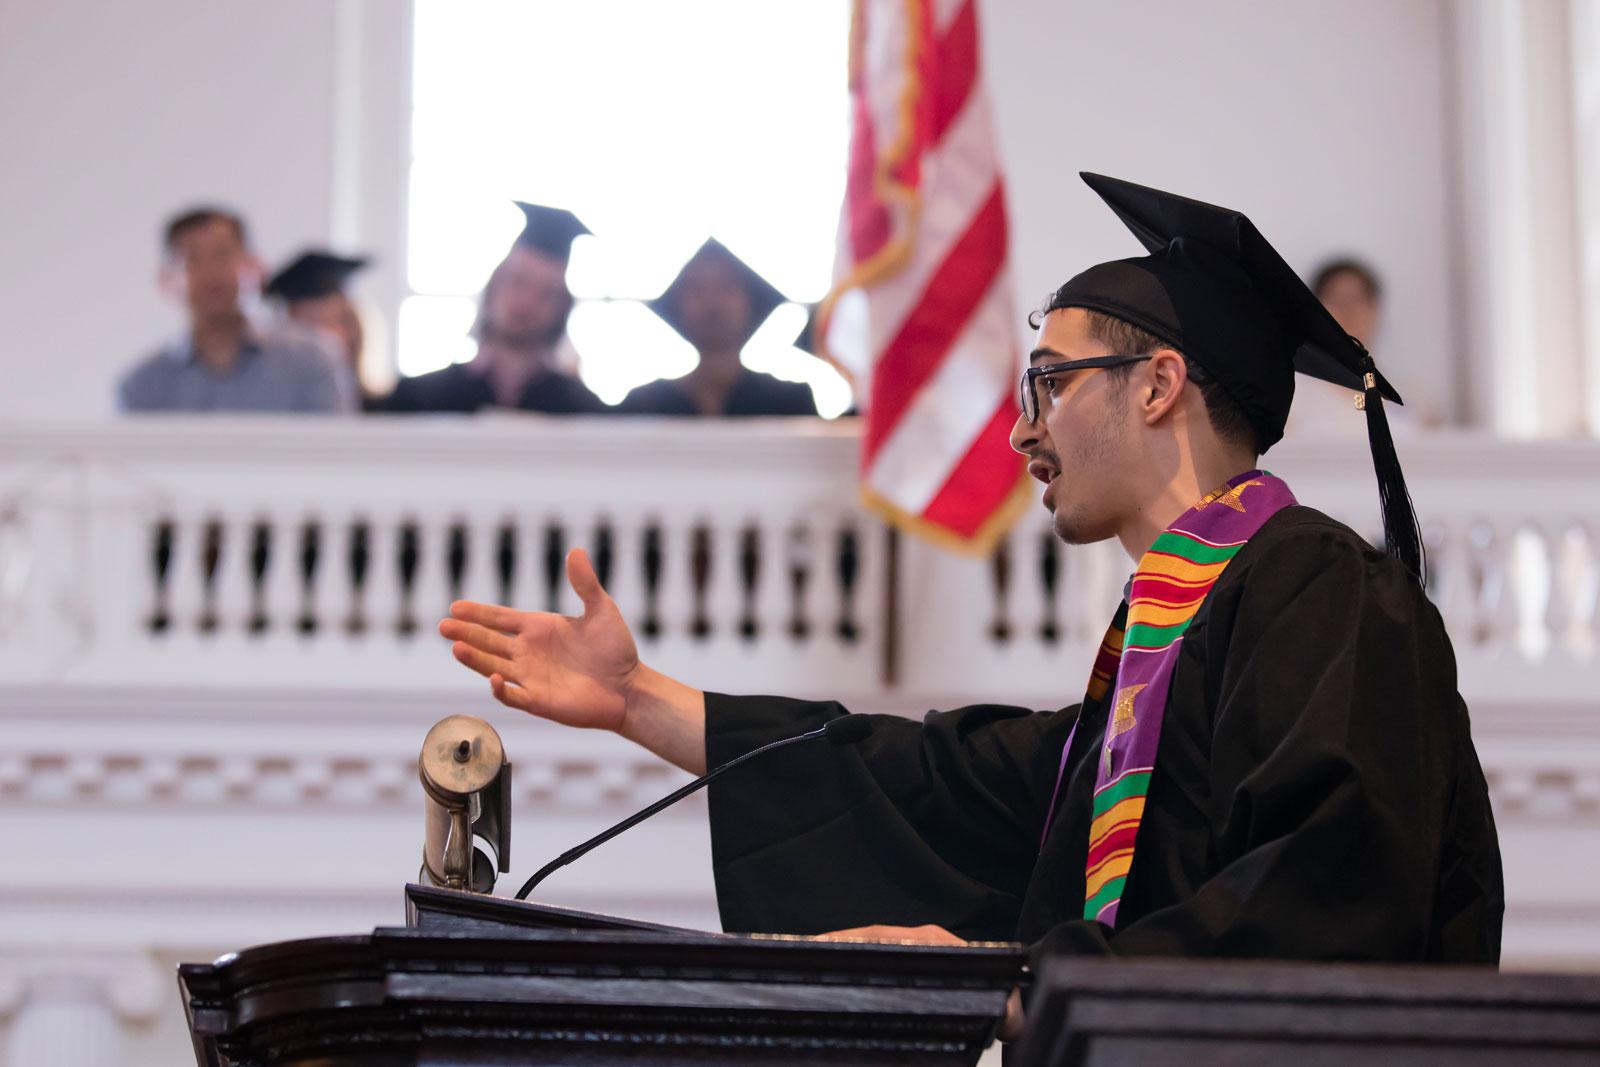 Mohamed Ahmed Ramy '18 speaks at the podium